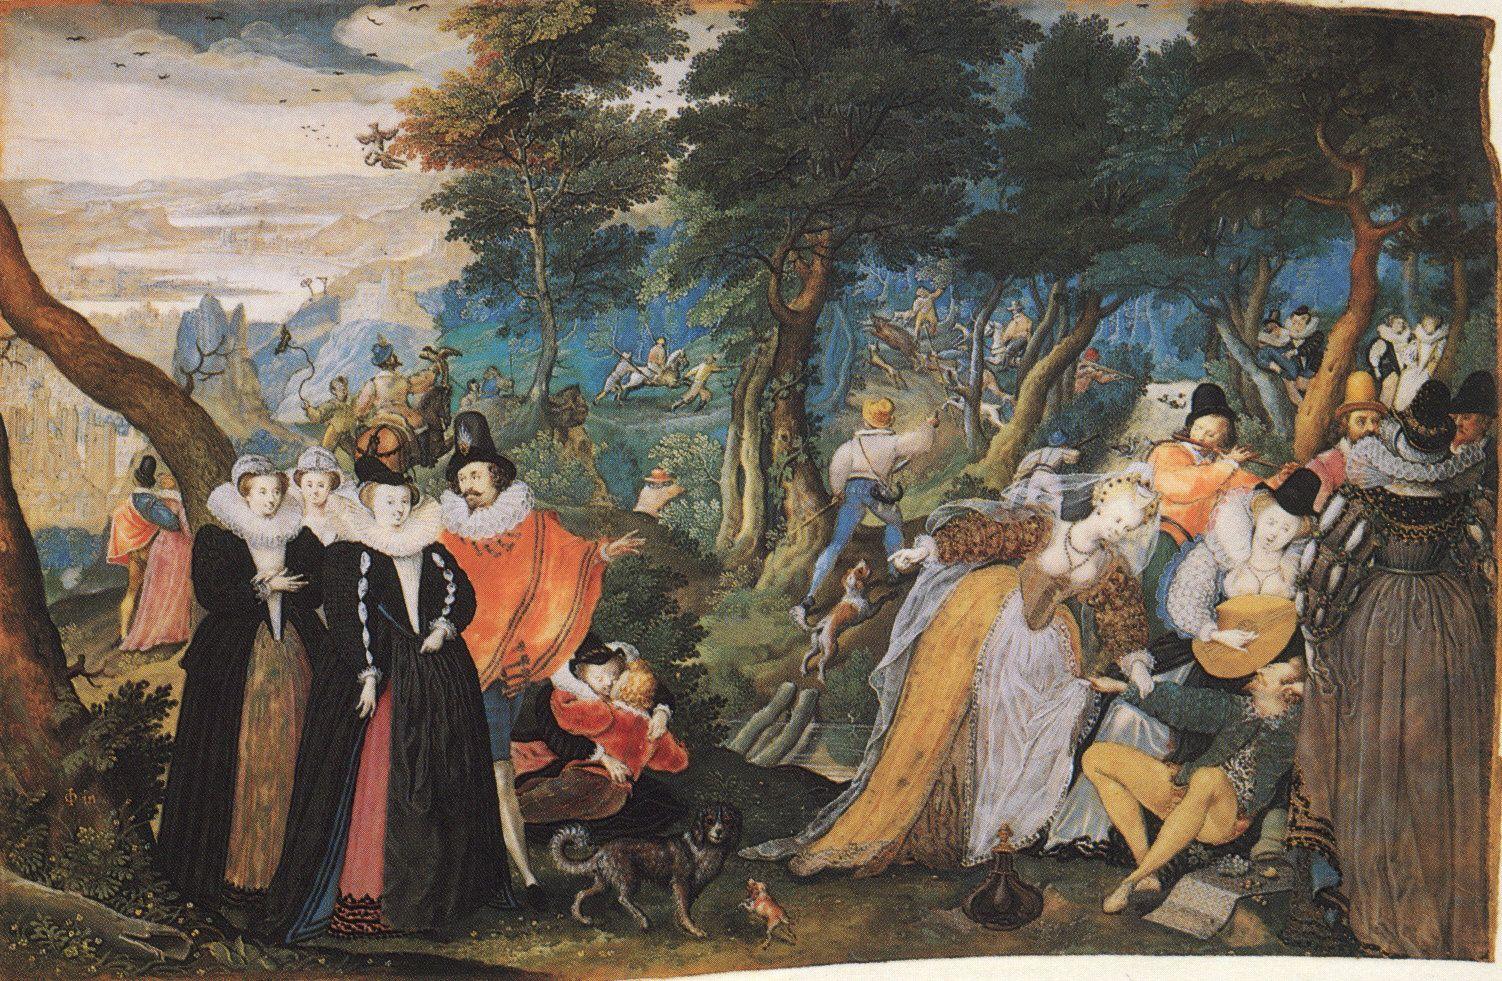 Slightly ridiculous allegorical scene containing shepherds